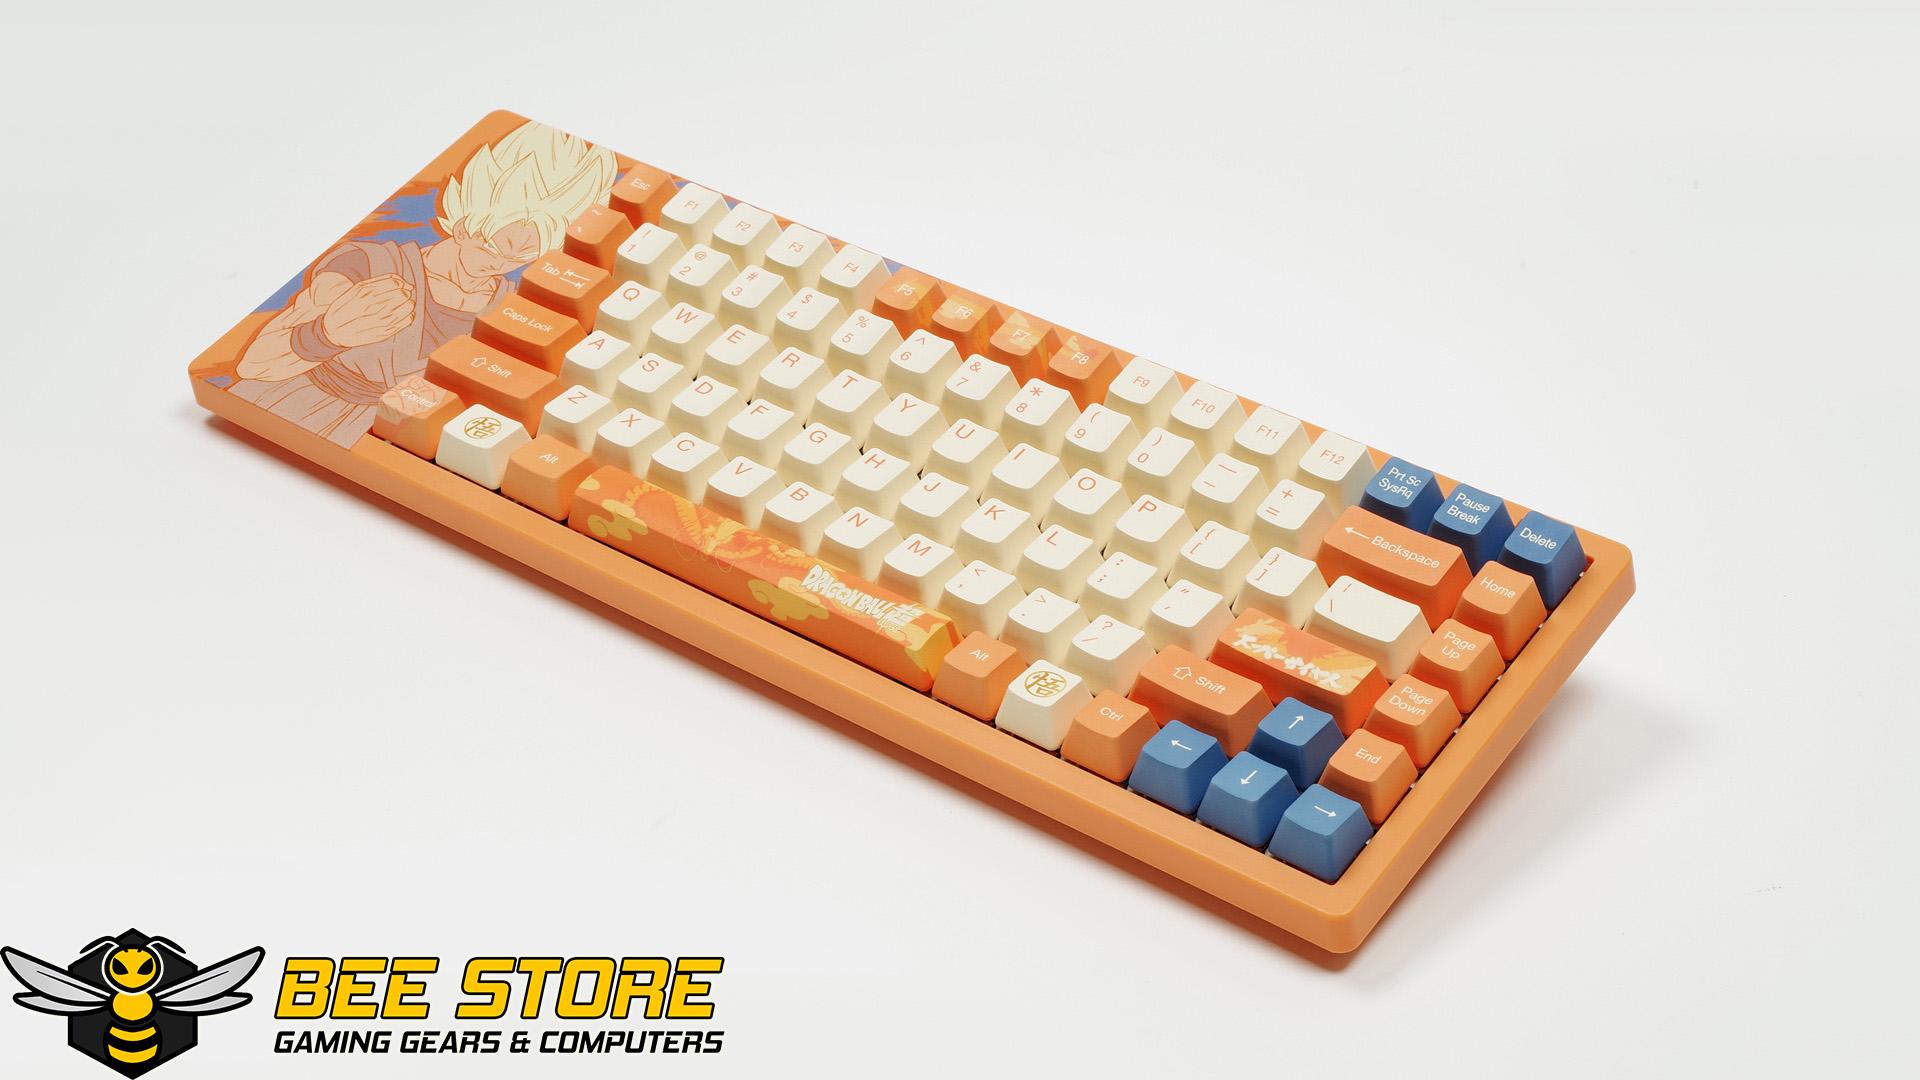 akko-3084-acg84-goku-beegaming-02